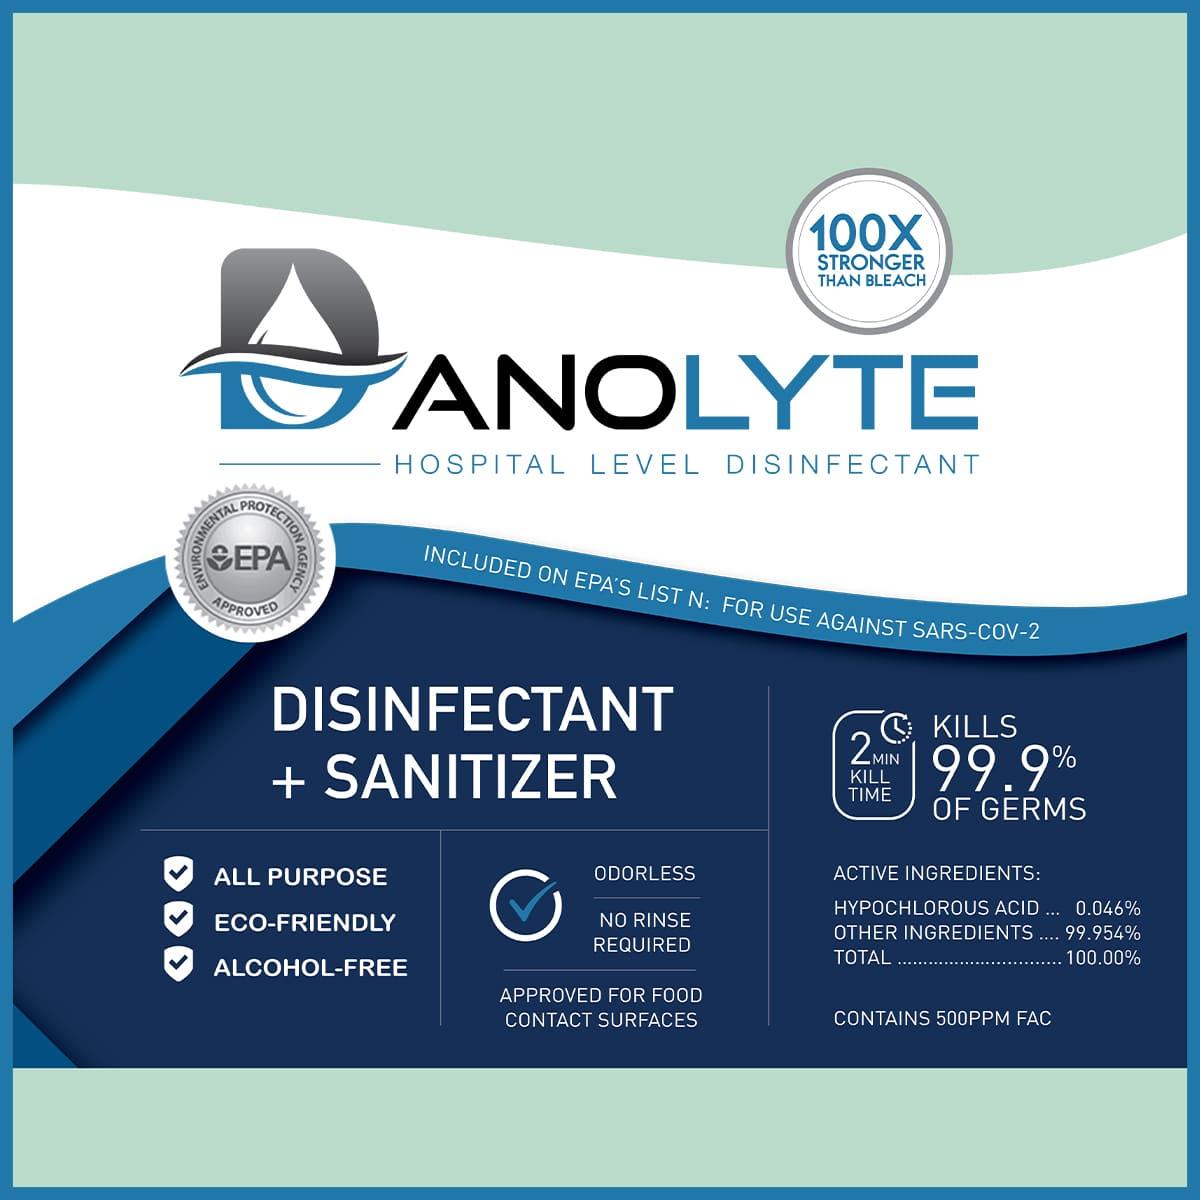 Danolyte Label